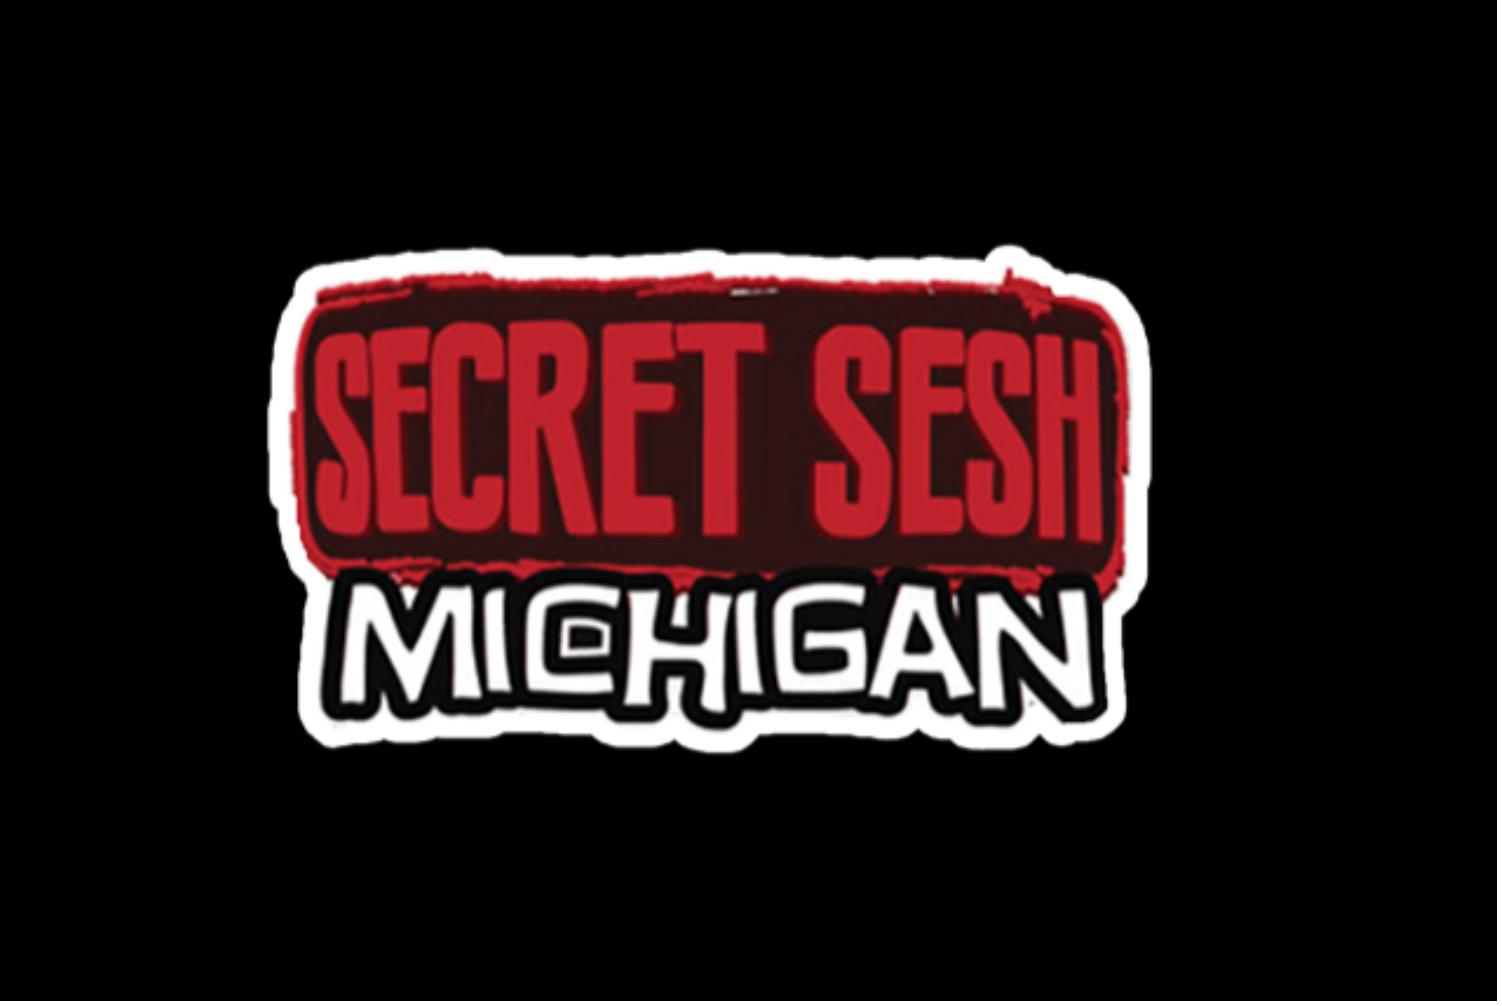 Secret Sesh February 17th